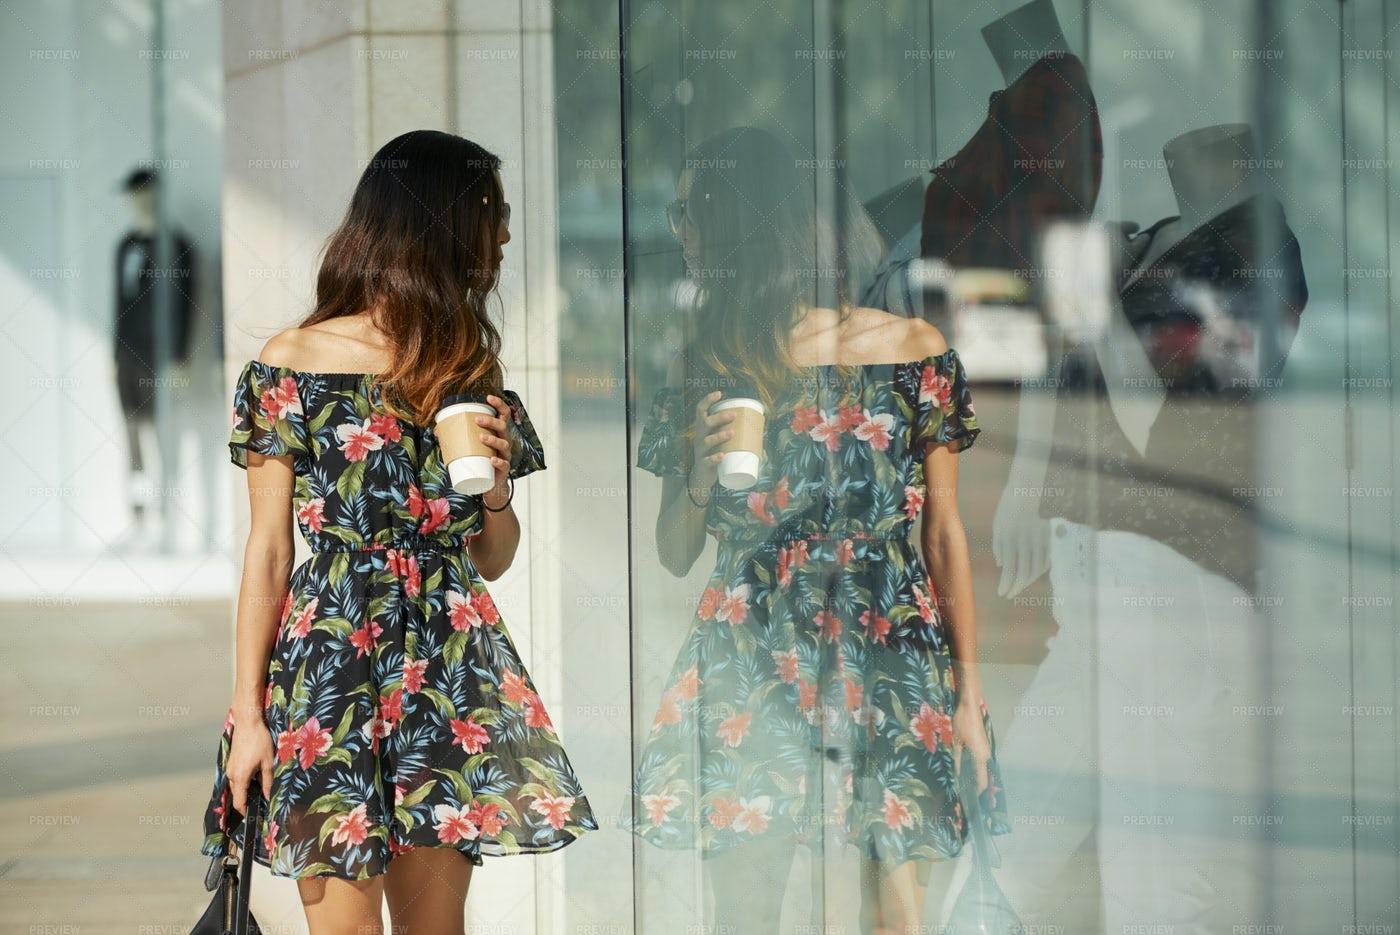 Pretty Woman Walking In The Street: Stock Photos